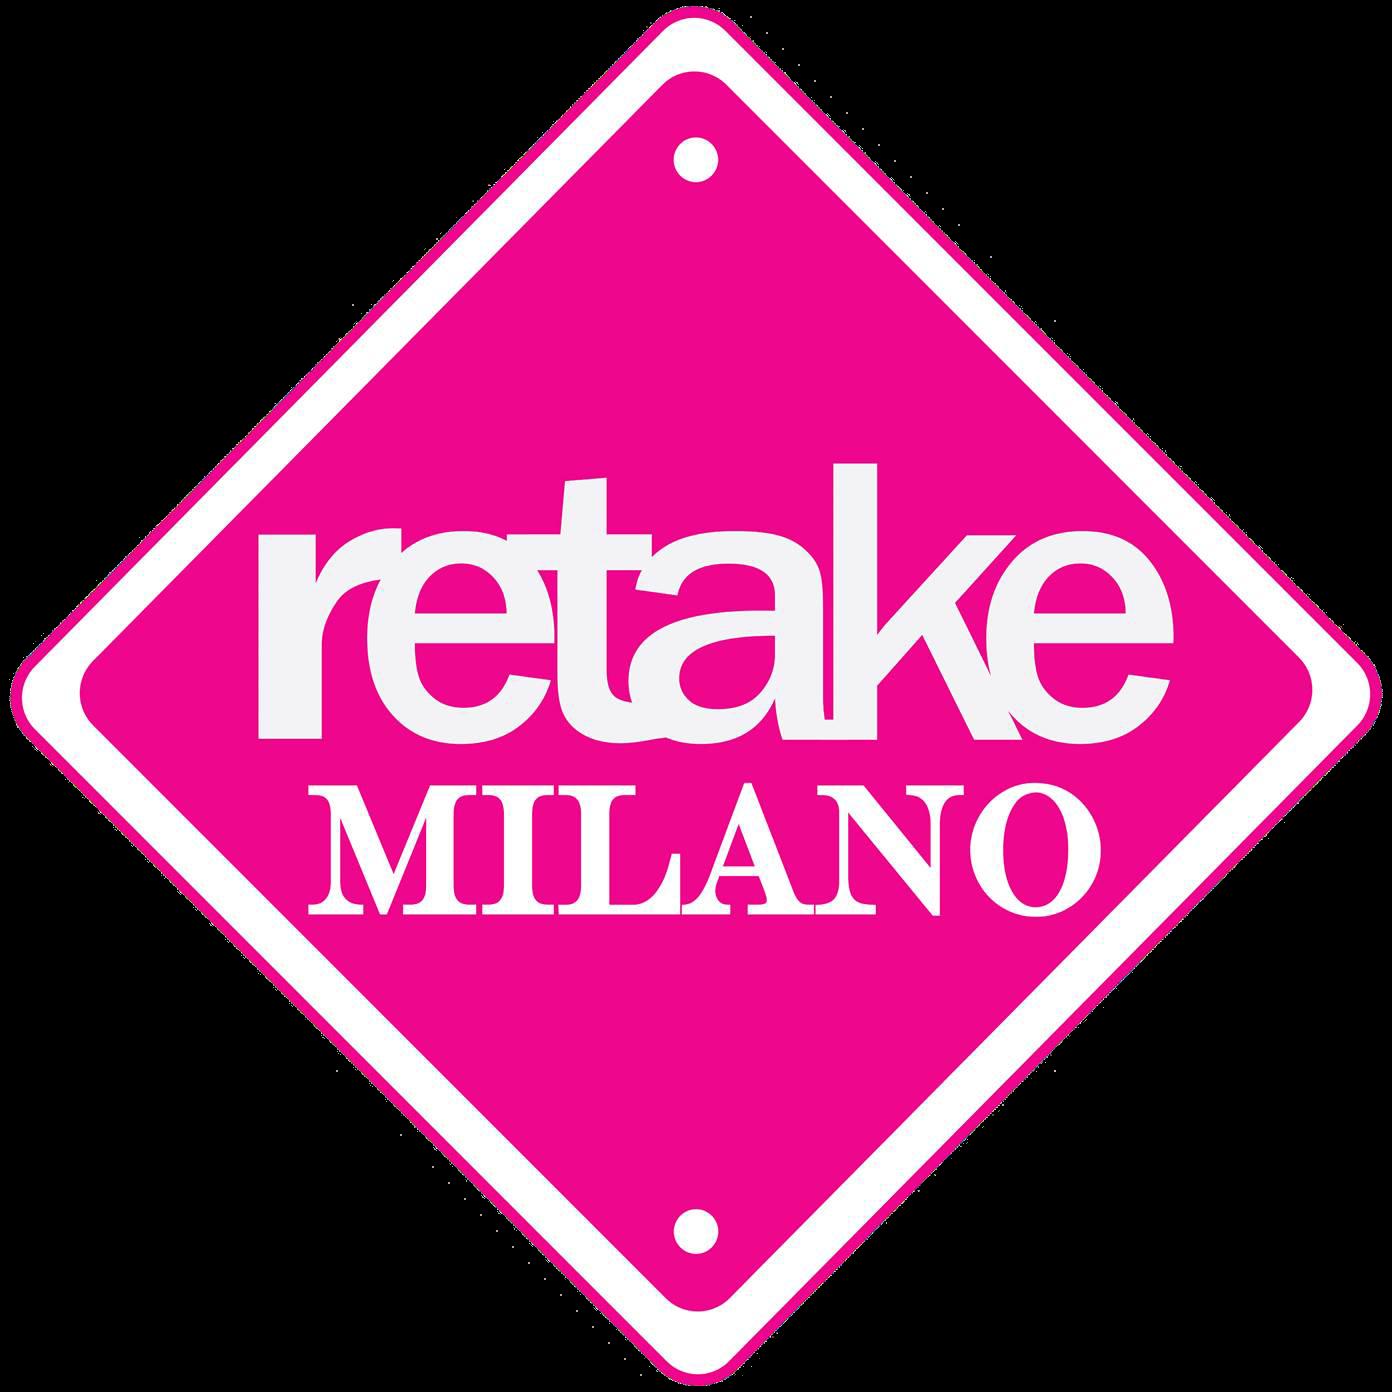 retake-milano-1392x1392